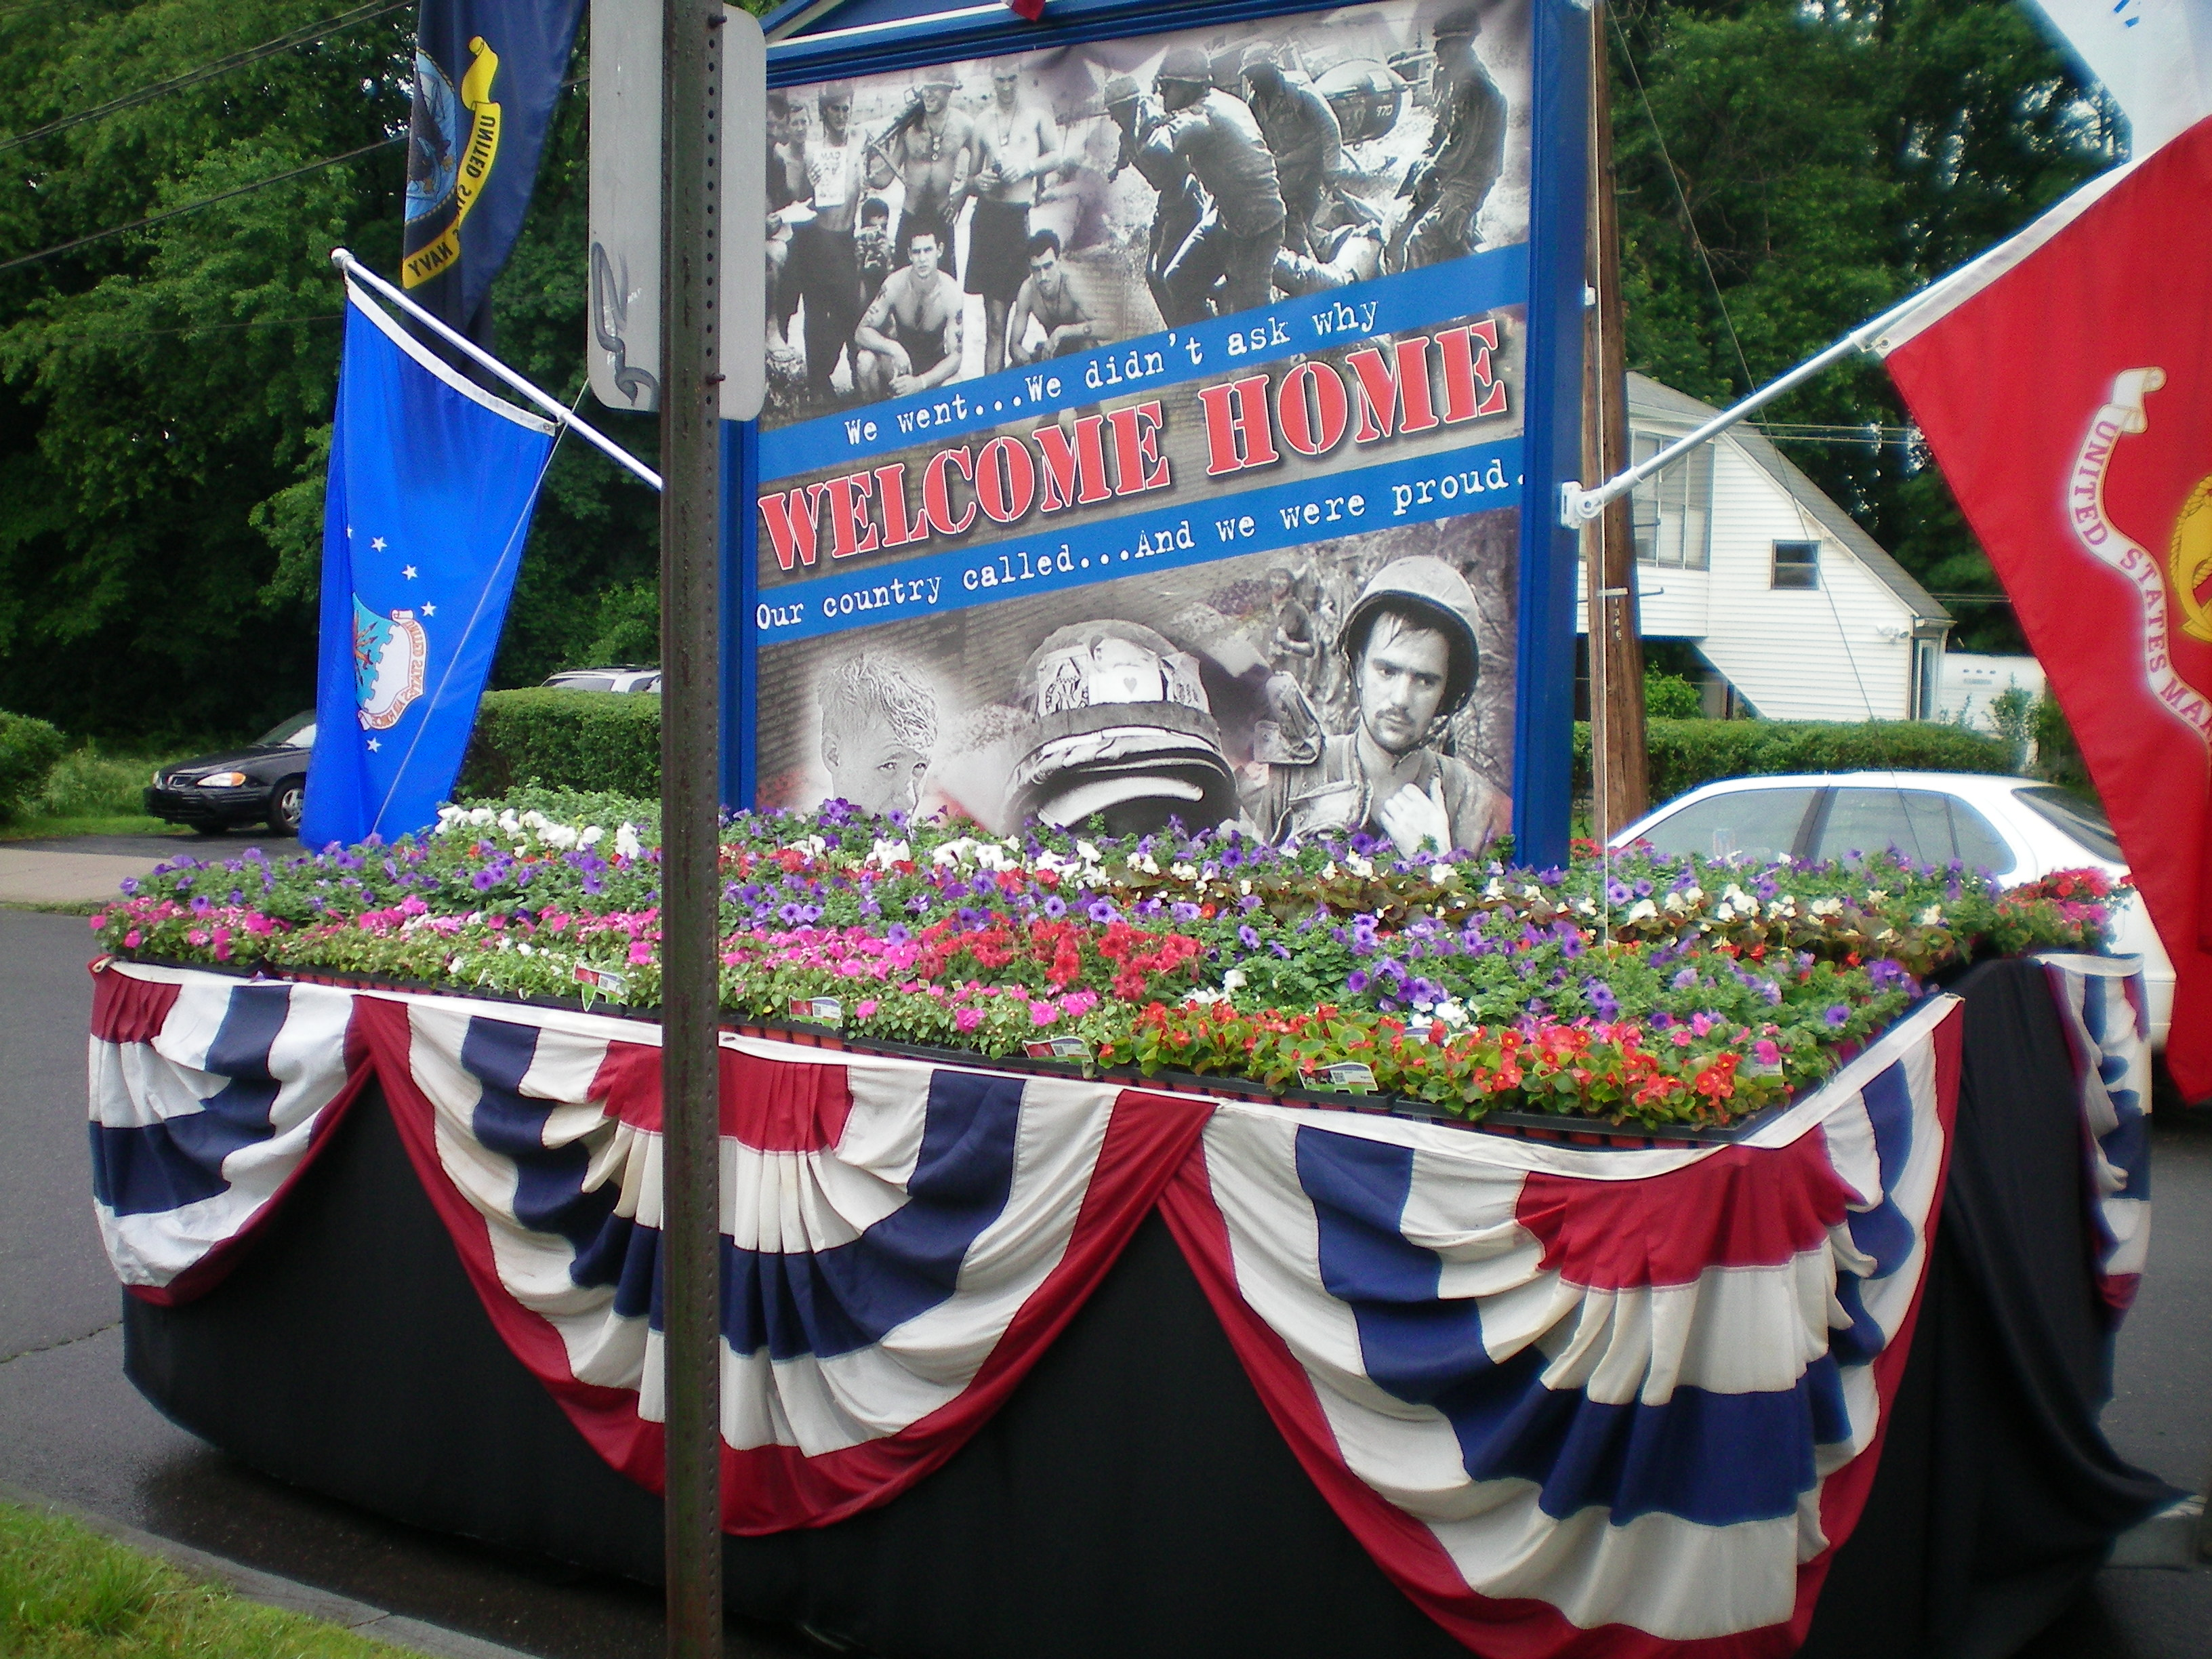 Veterans day parade floats